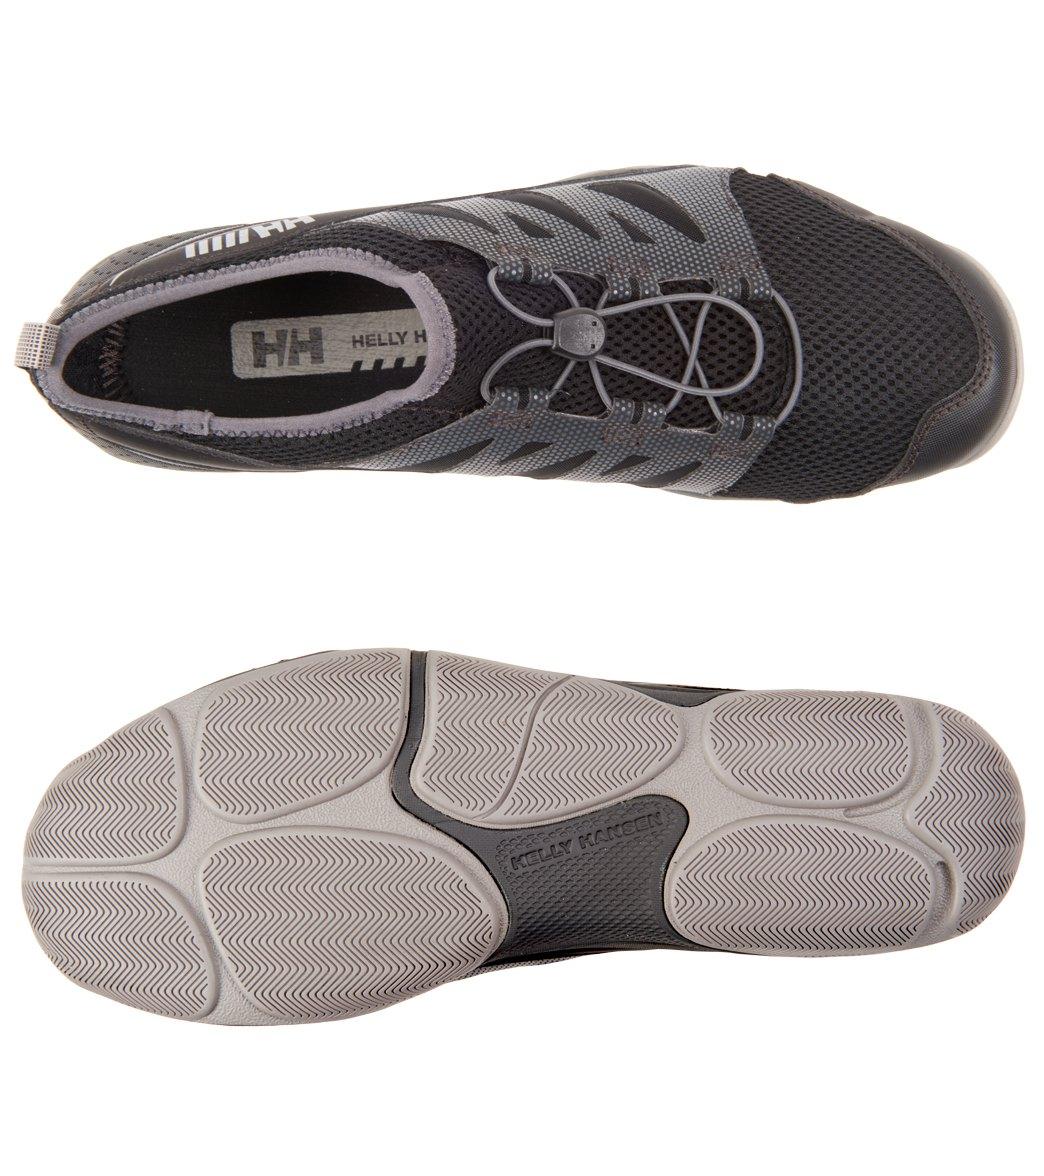 b350ab0b08c4 Helly Hansen Men s Aquapace 2 Water Shoes at SwimOutlet.com - Free ...